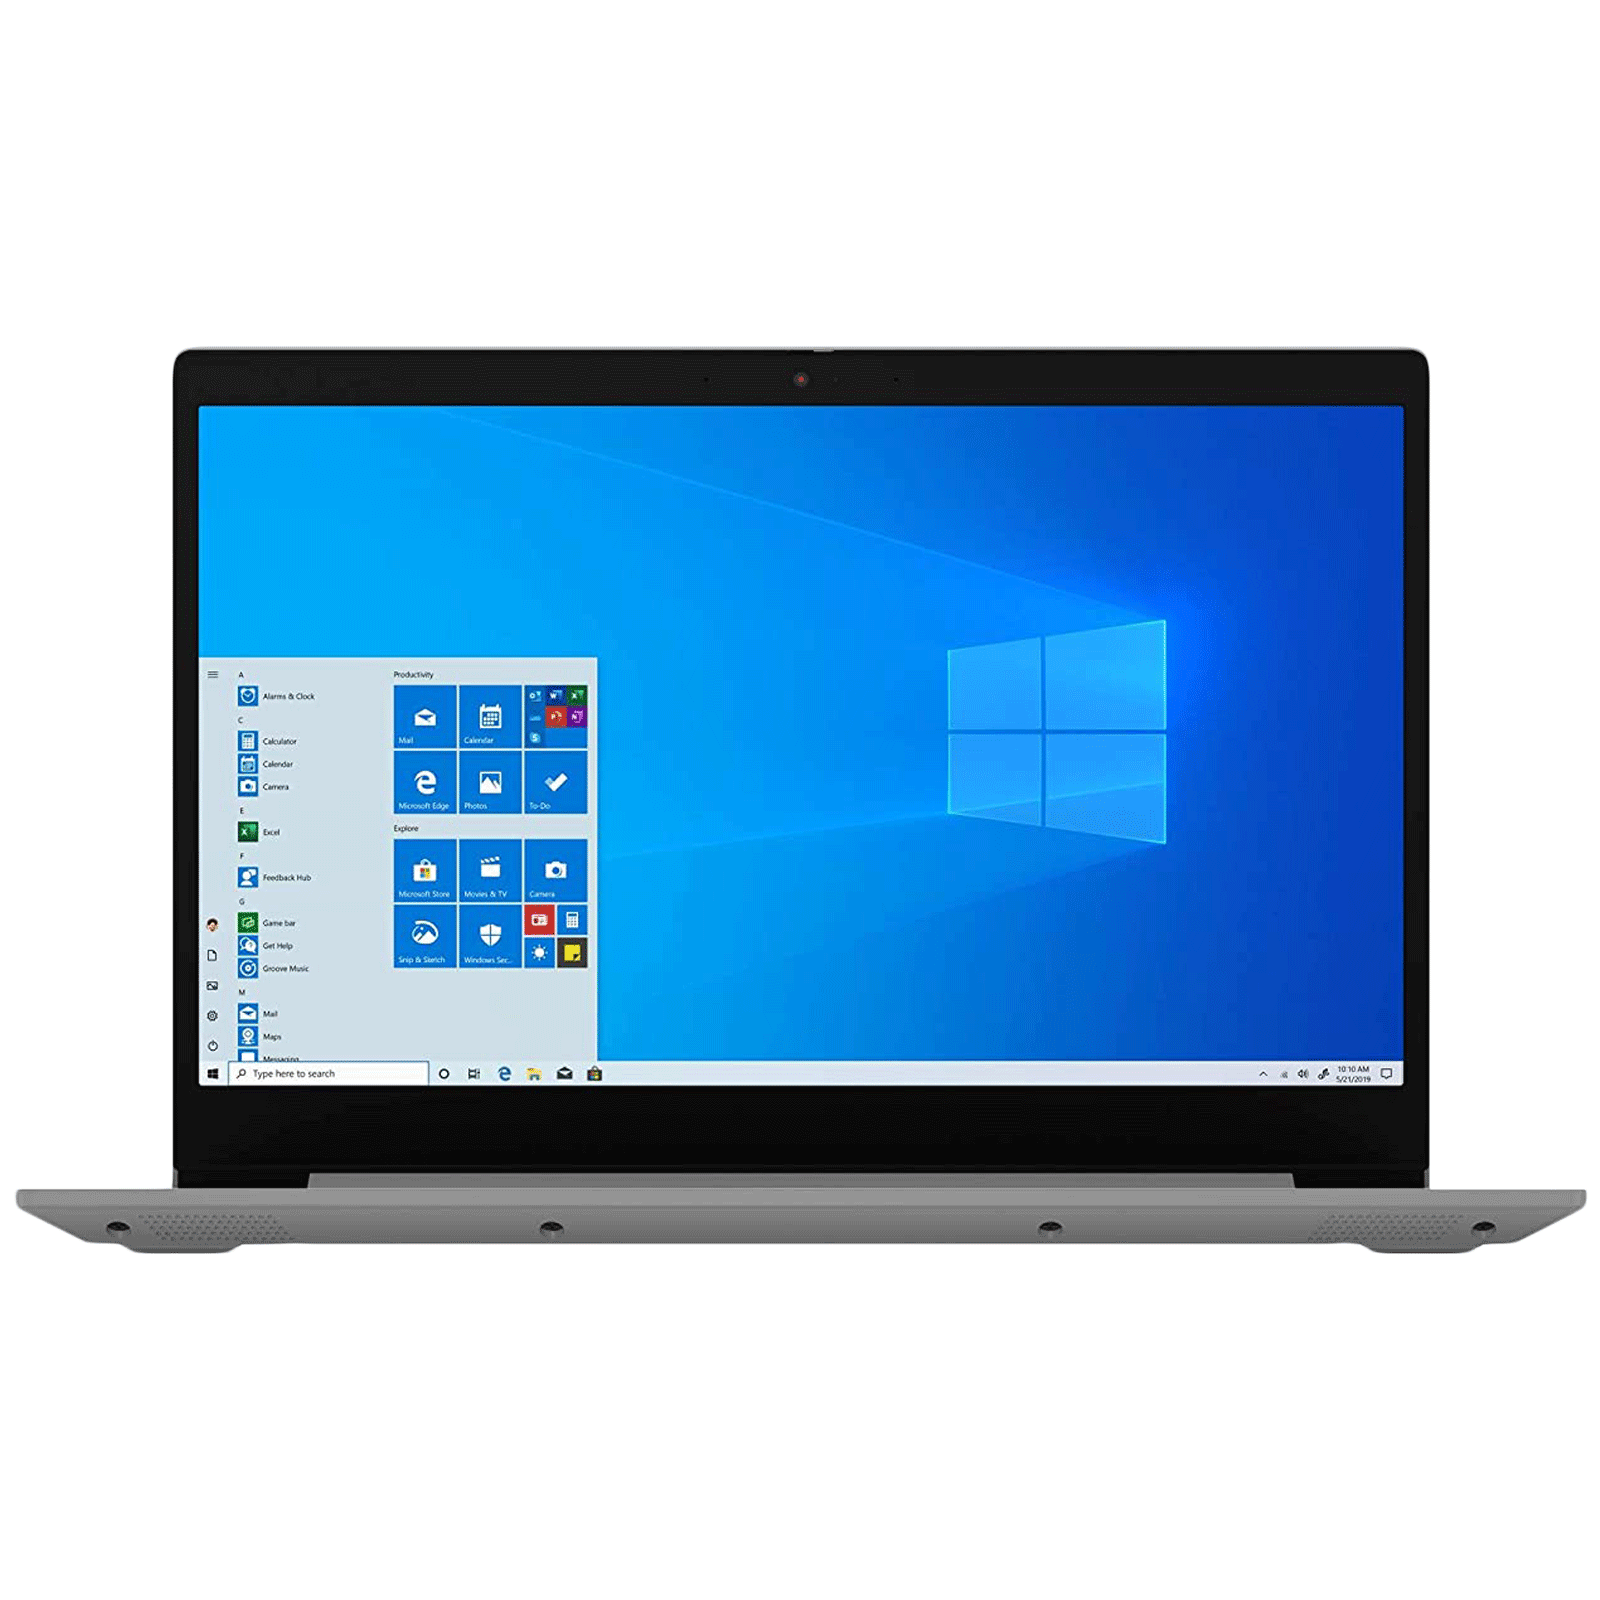 Lenovo IdeaPad 3 15ADA05 Ryzen 3 Windows 10 Home Thin and Light Laptop (8GB RAM, 256GB SSD, AMD Radeon Graphics, MS Office, 39.6cm, 81W101QYIN, Platinum Grey)_1